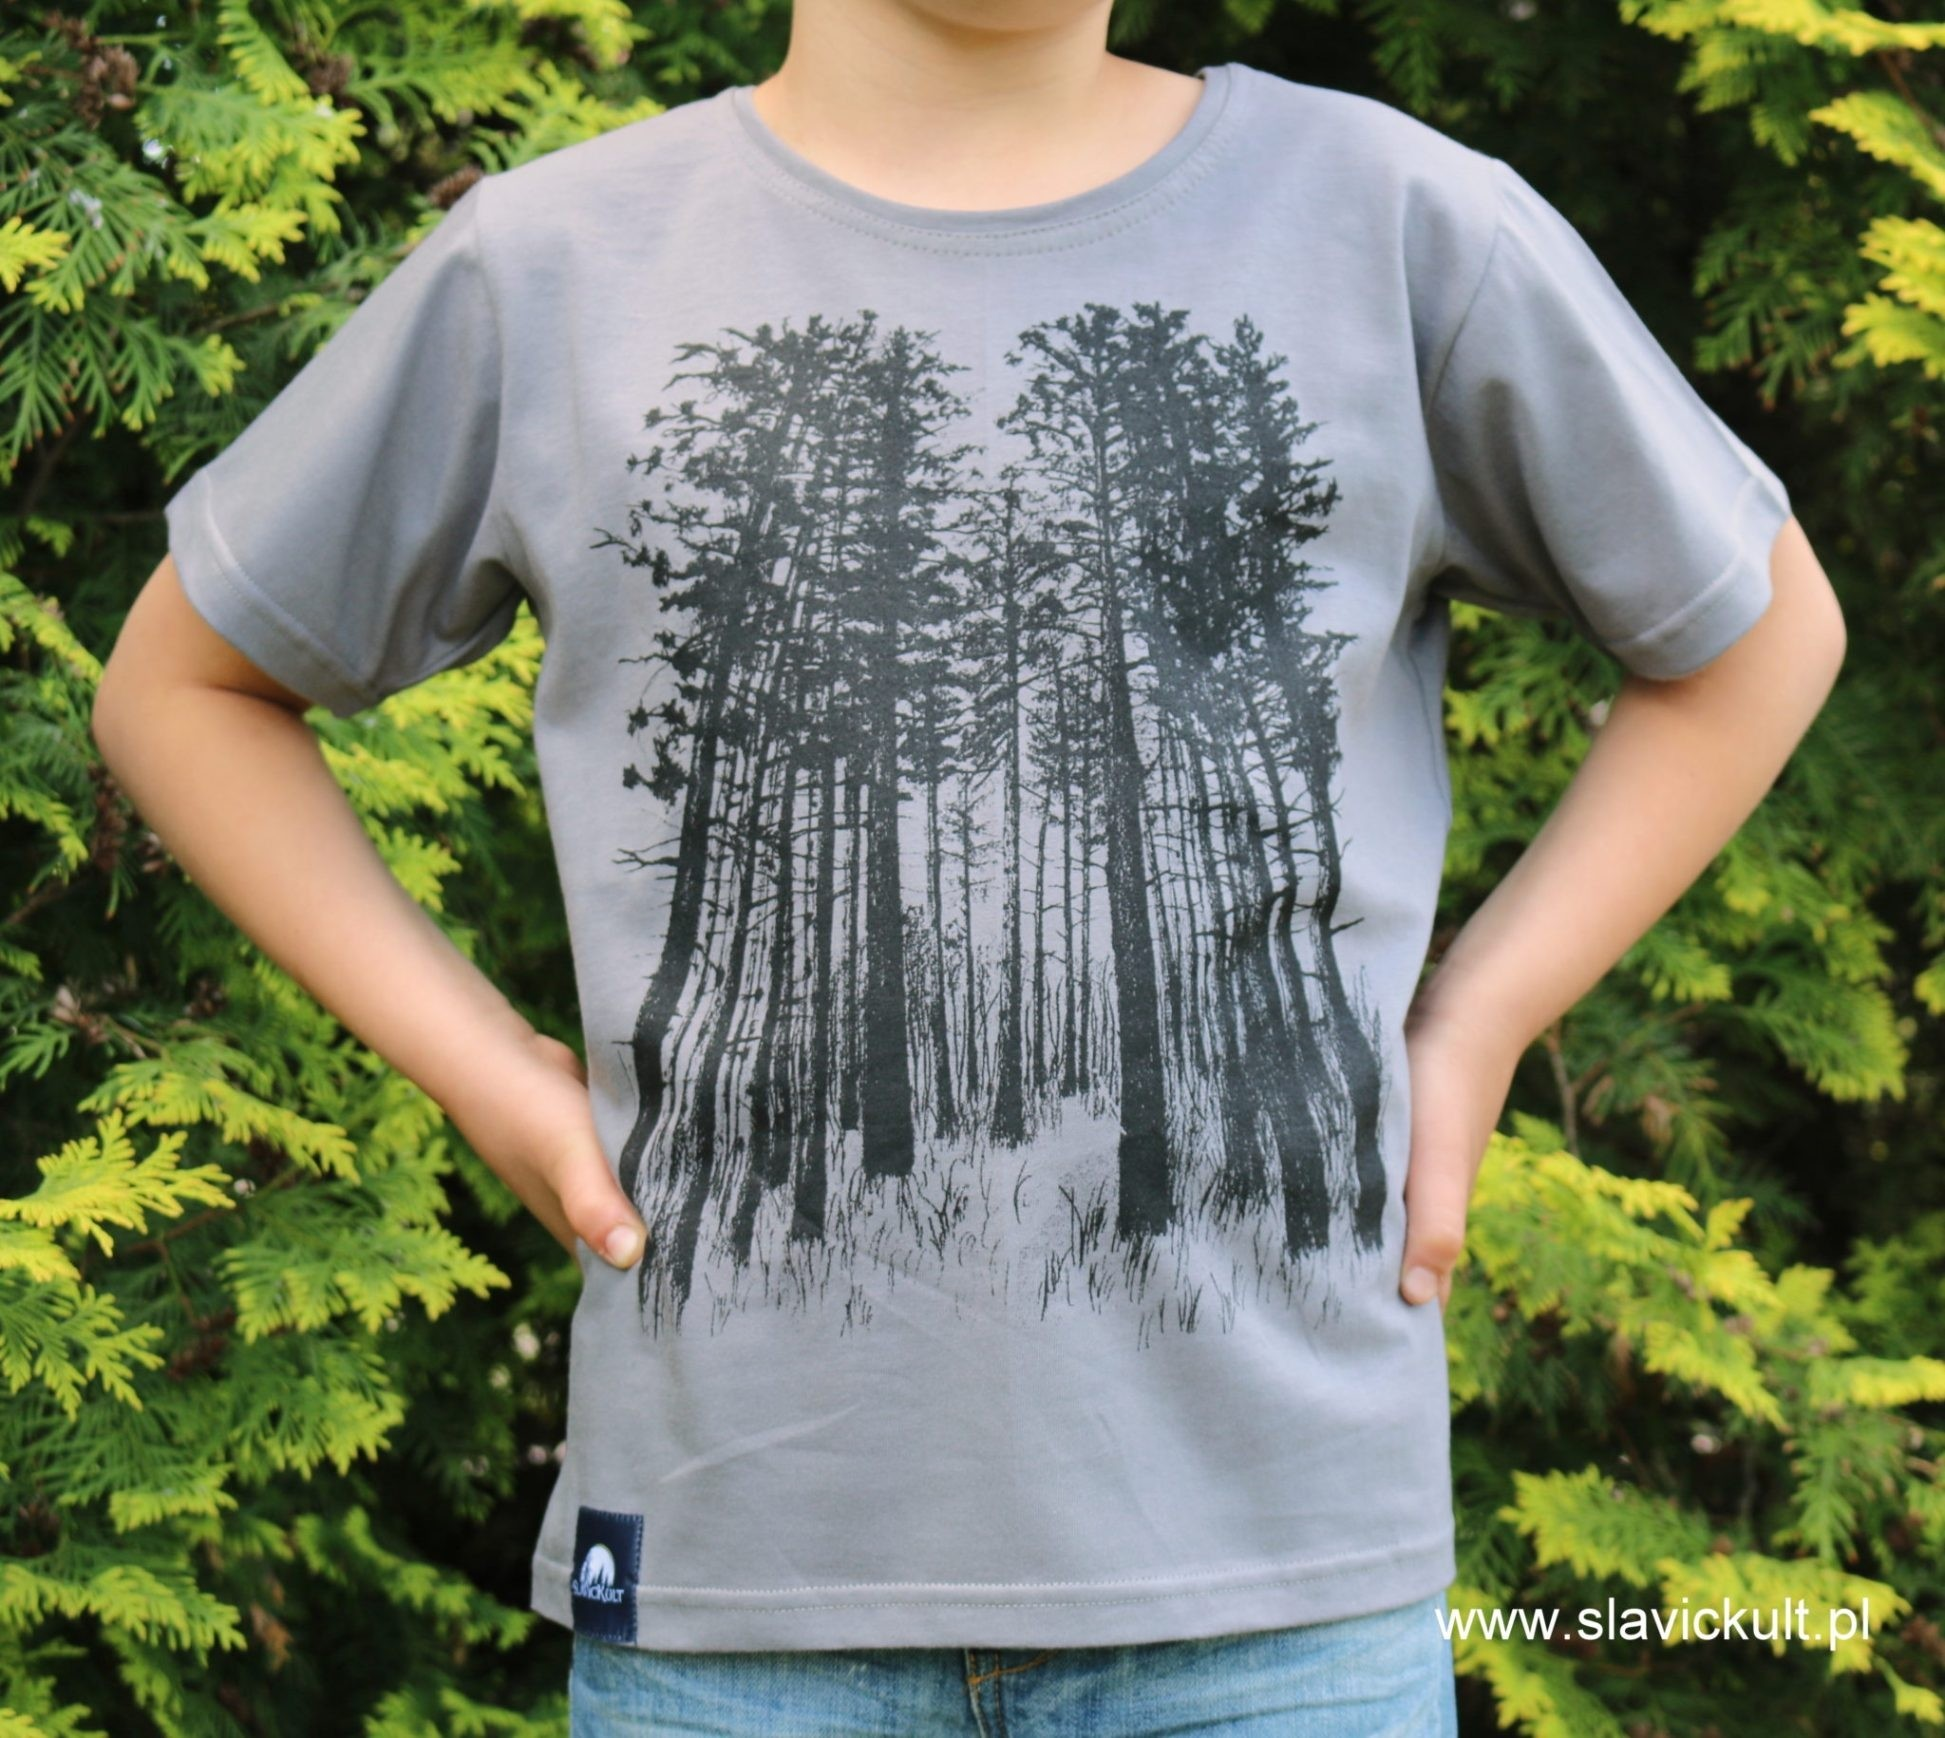 Koszulka Las (Szara) dla dziecka